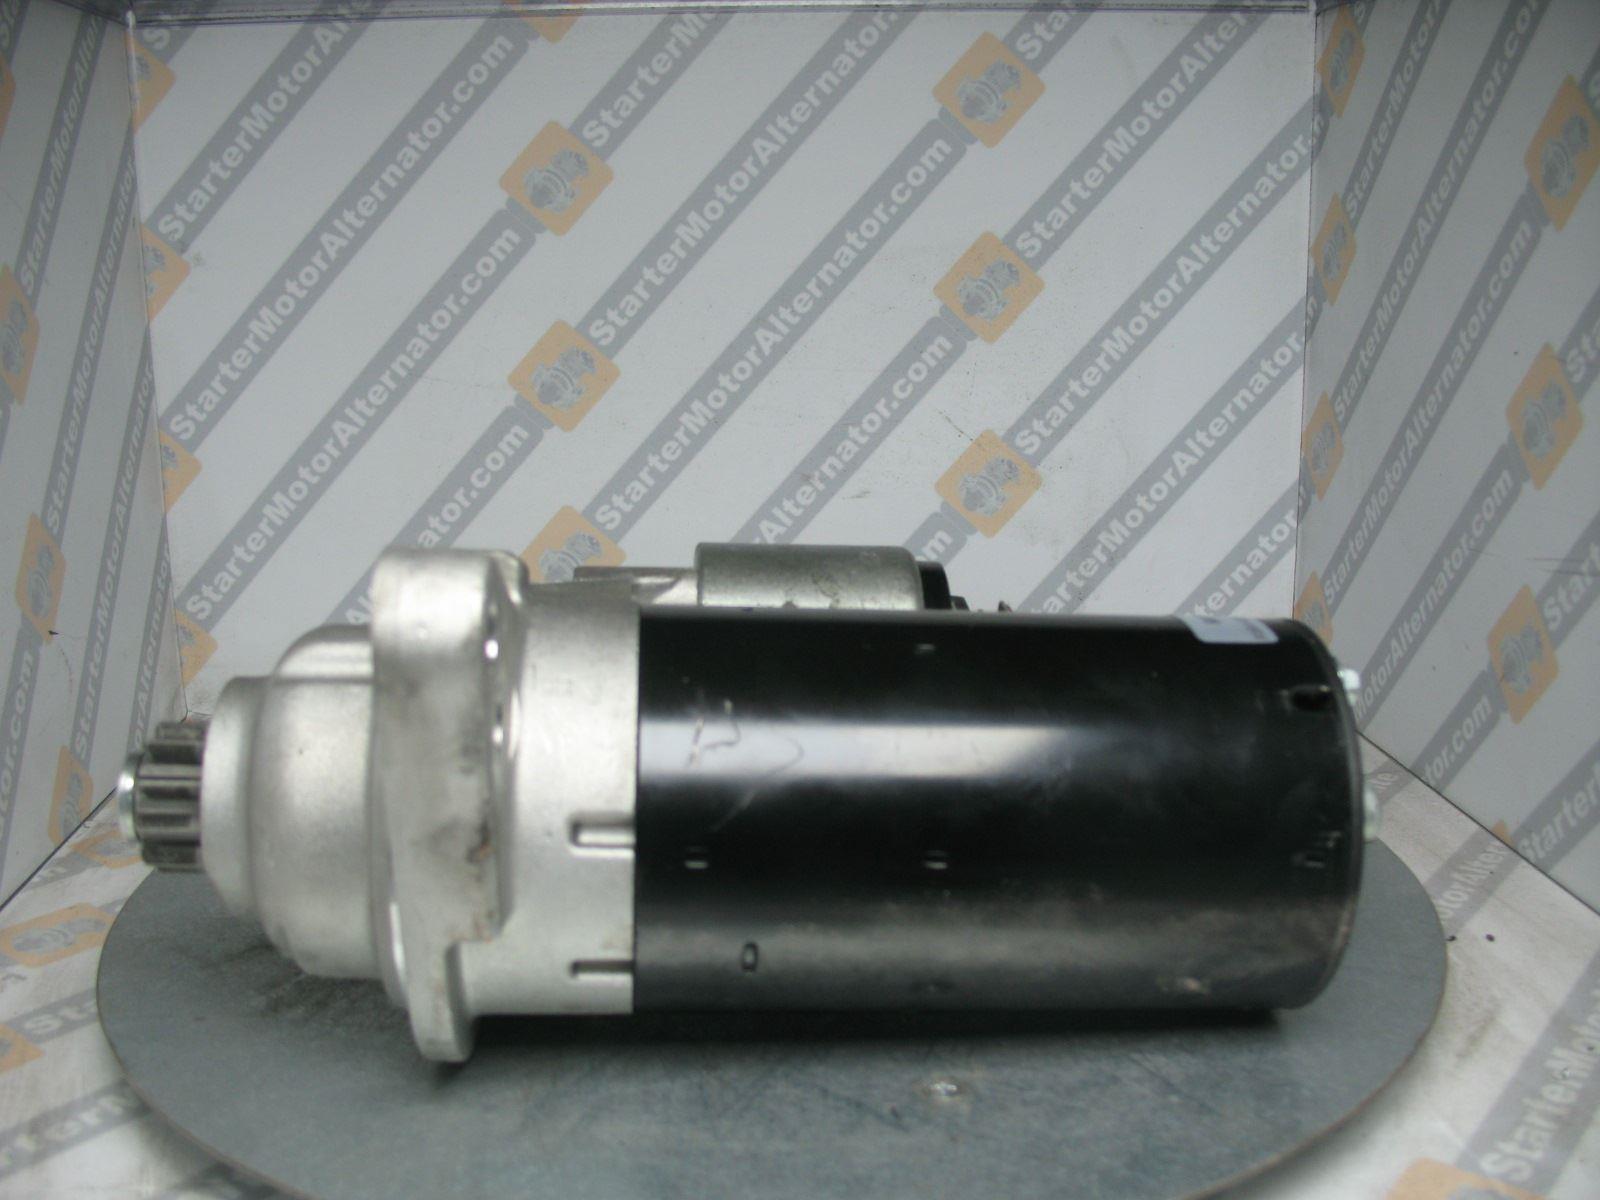 XIU1293 Starter Motor For Audi / Seat / Skoda / Volkswagen